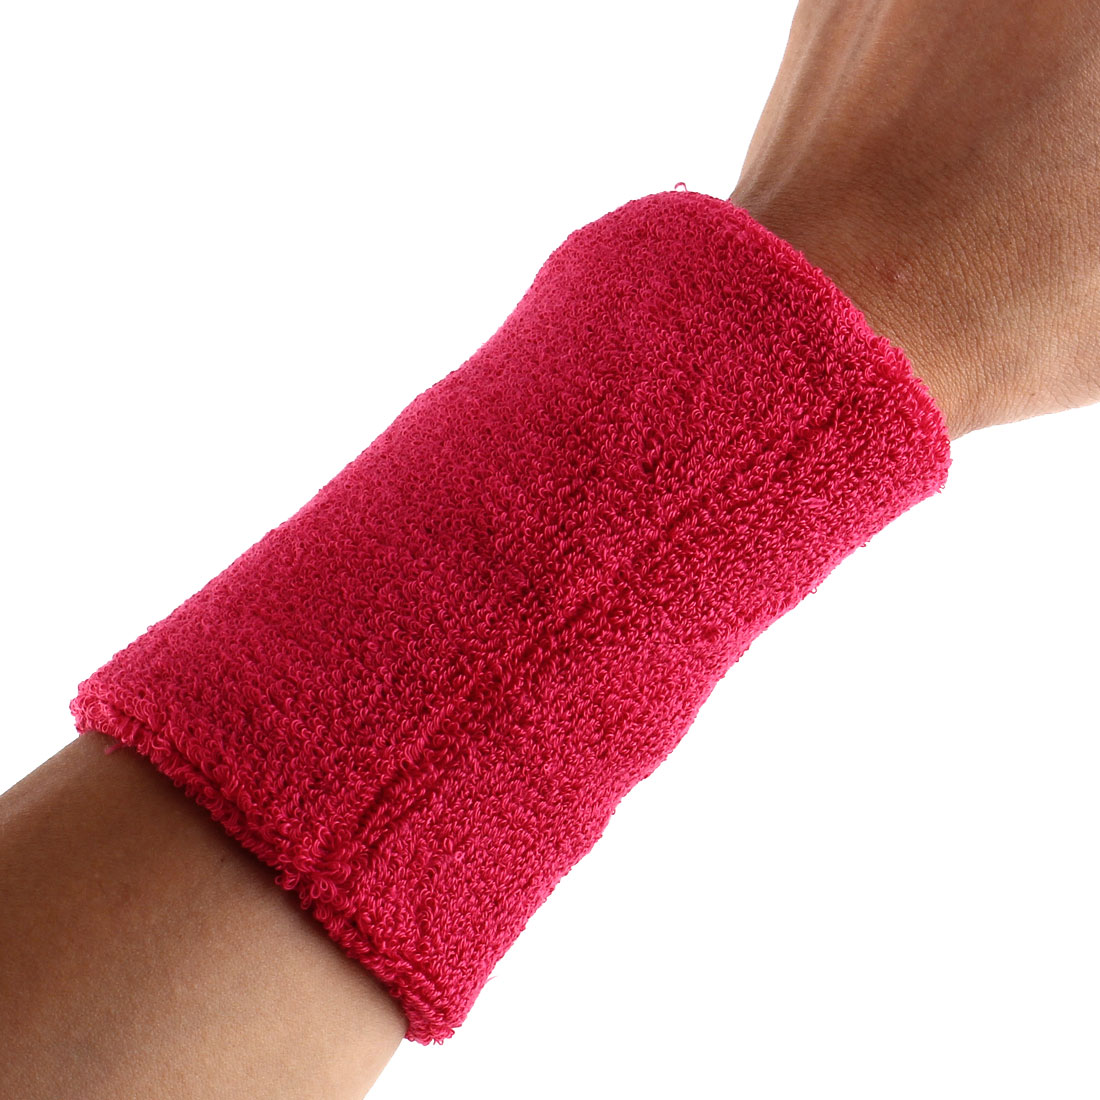 Exercises Football Gym Elastic Strap Hand Protector Sweatband Sport Wrist Fuchsia 2pcs